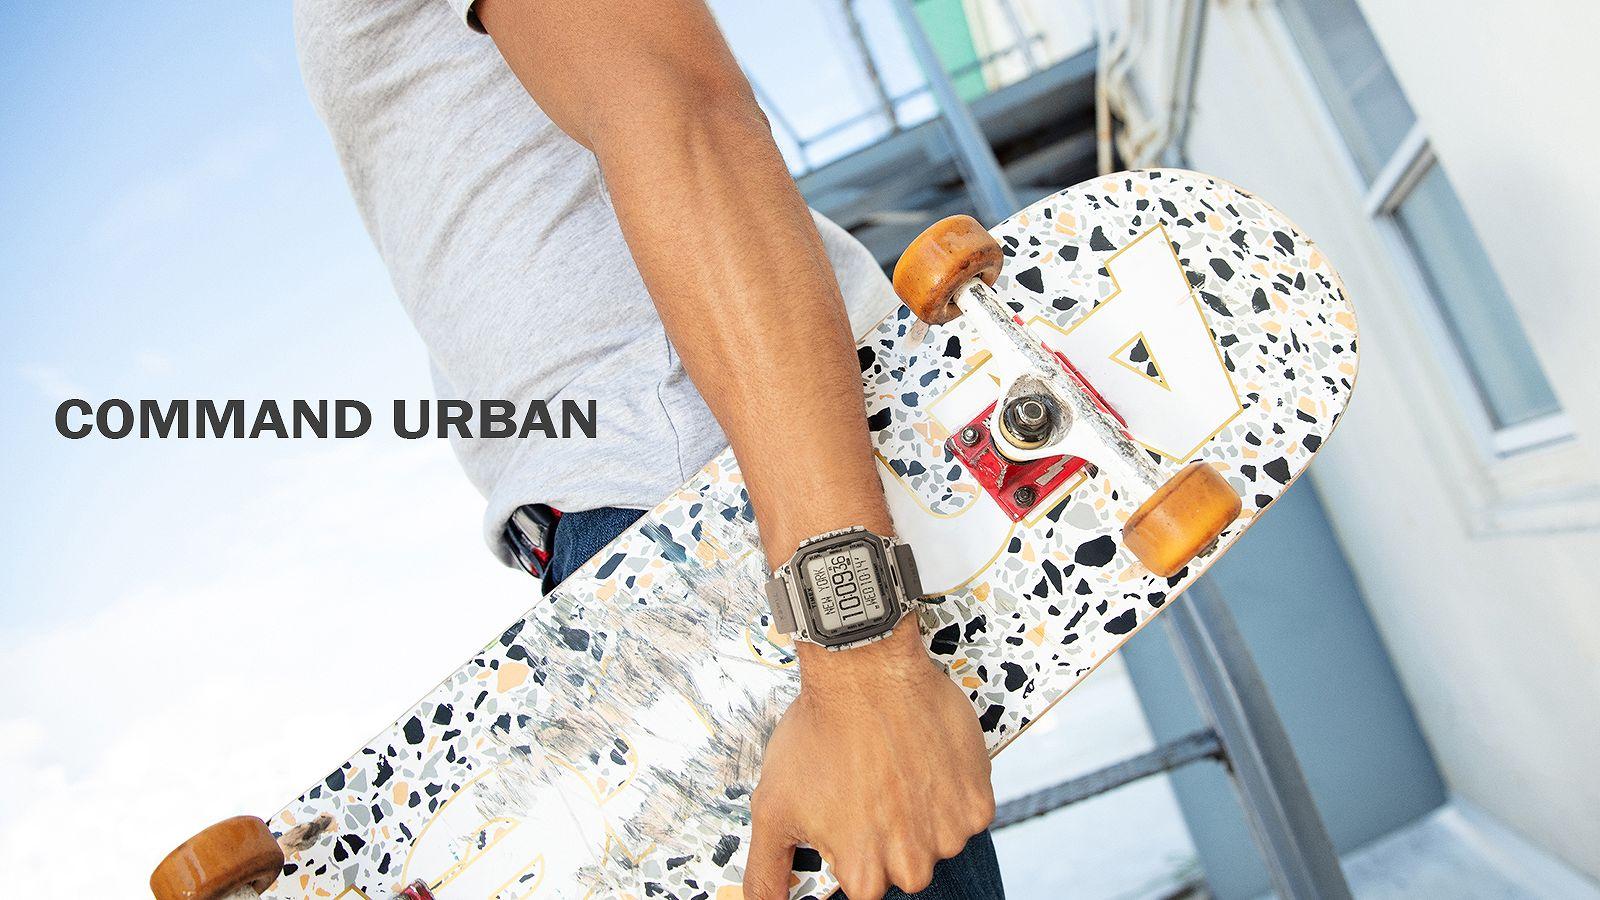 Command Urban